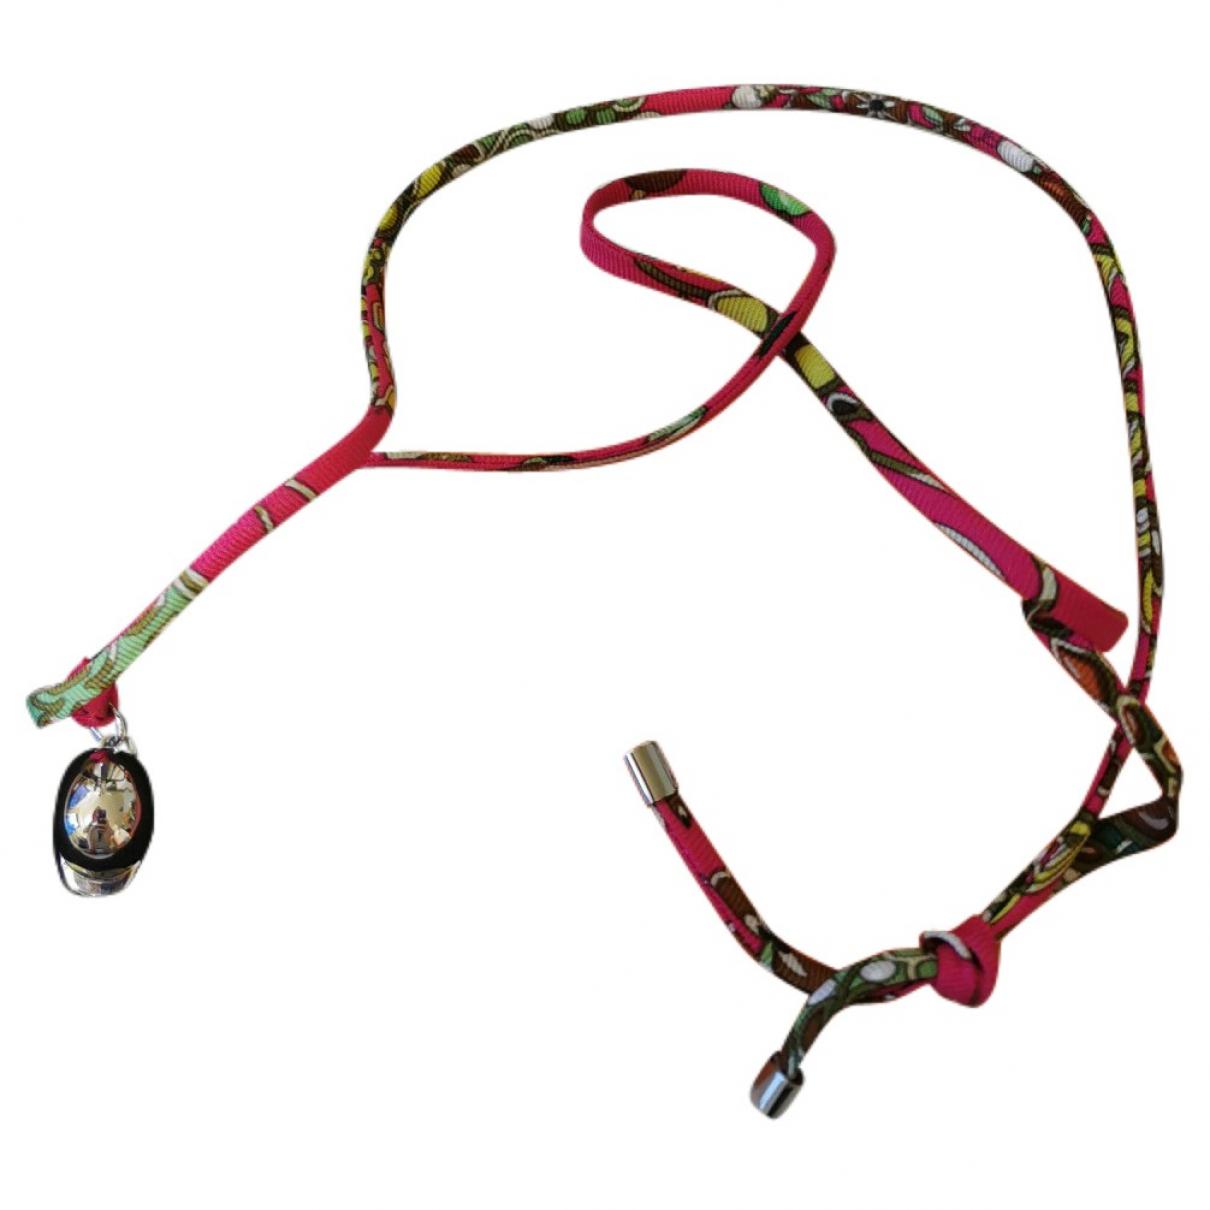 Hermes - Bracelet   pour femme en toile - rose